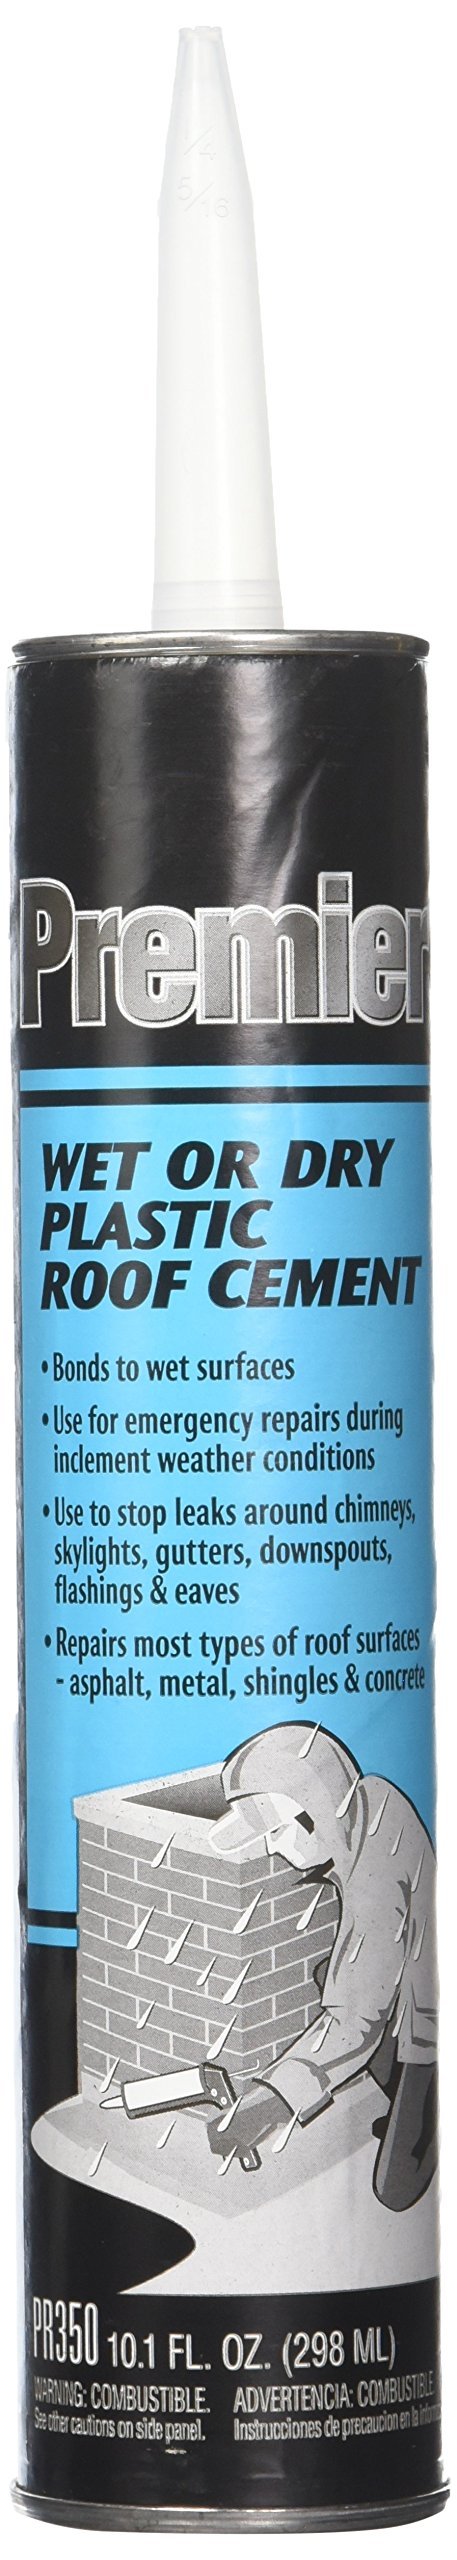 Henry CO TV205696 Premie 11 oz Roof Cement